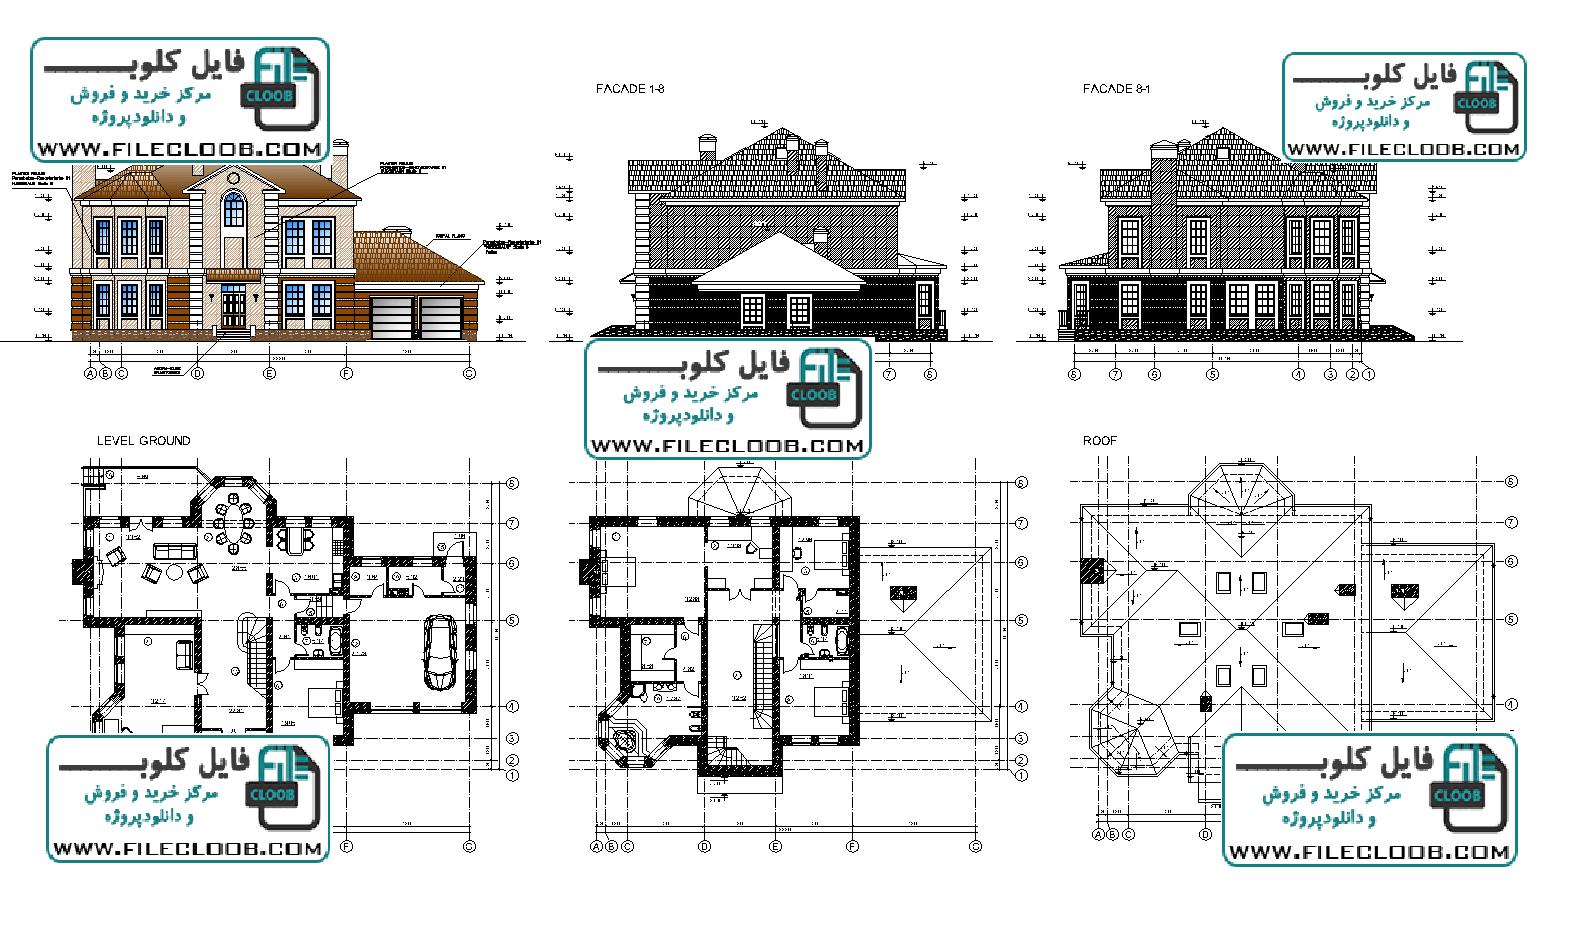 نقشه های کامل ویلا ی دوبلکس به صورت اتوکد dwg / پلان ویلای دوبلکس / پلان ویلای کلاسیک / villa plan / villa .dwg